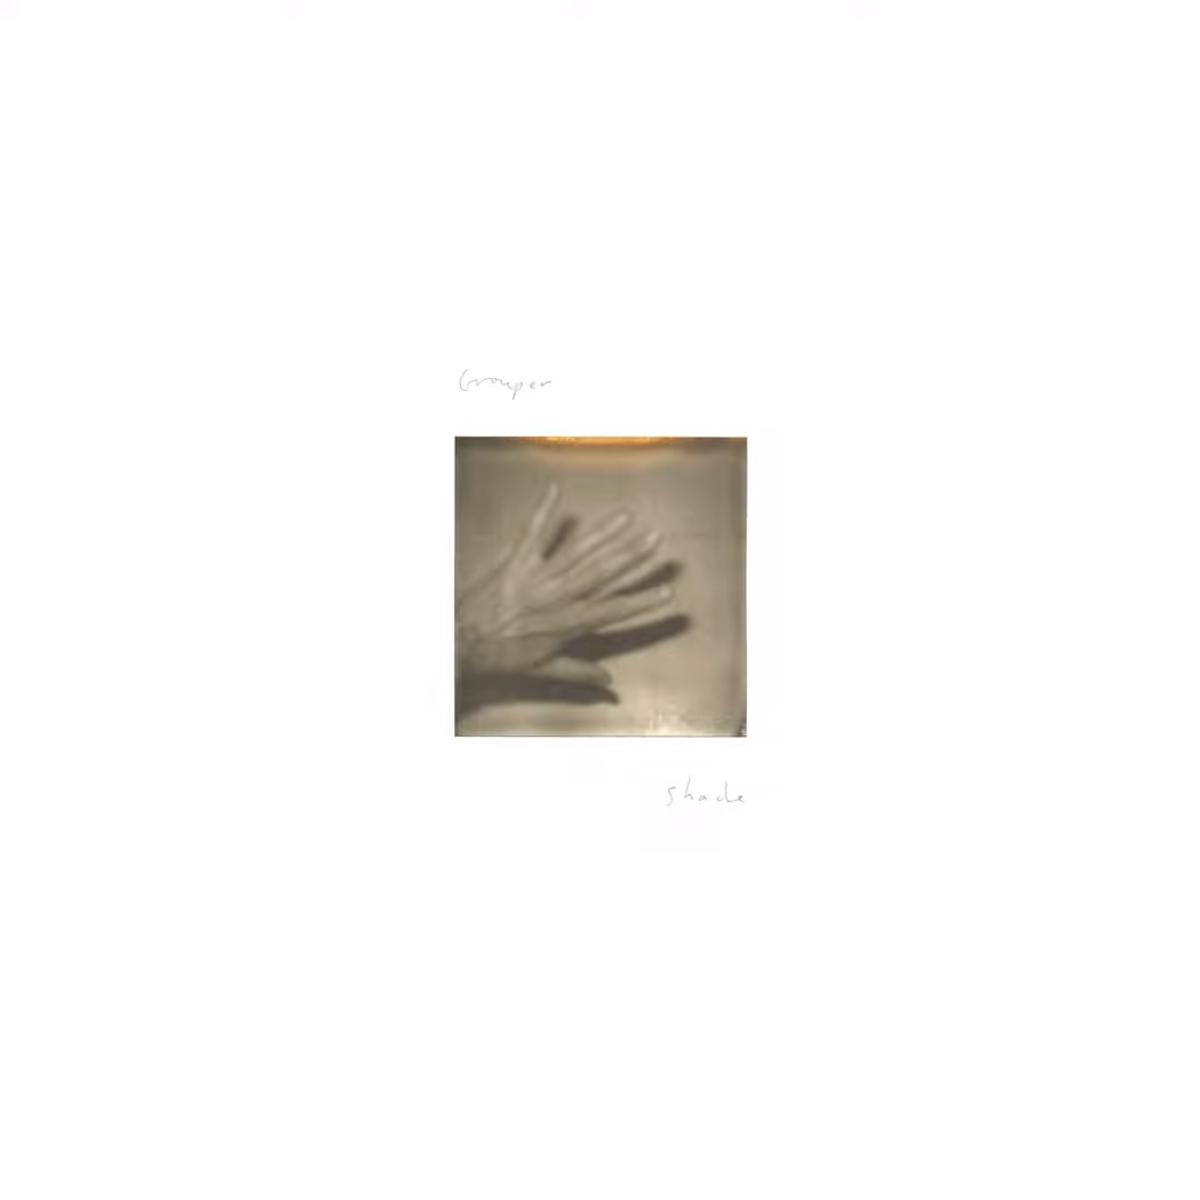 Grouper Shade Cover Art